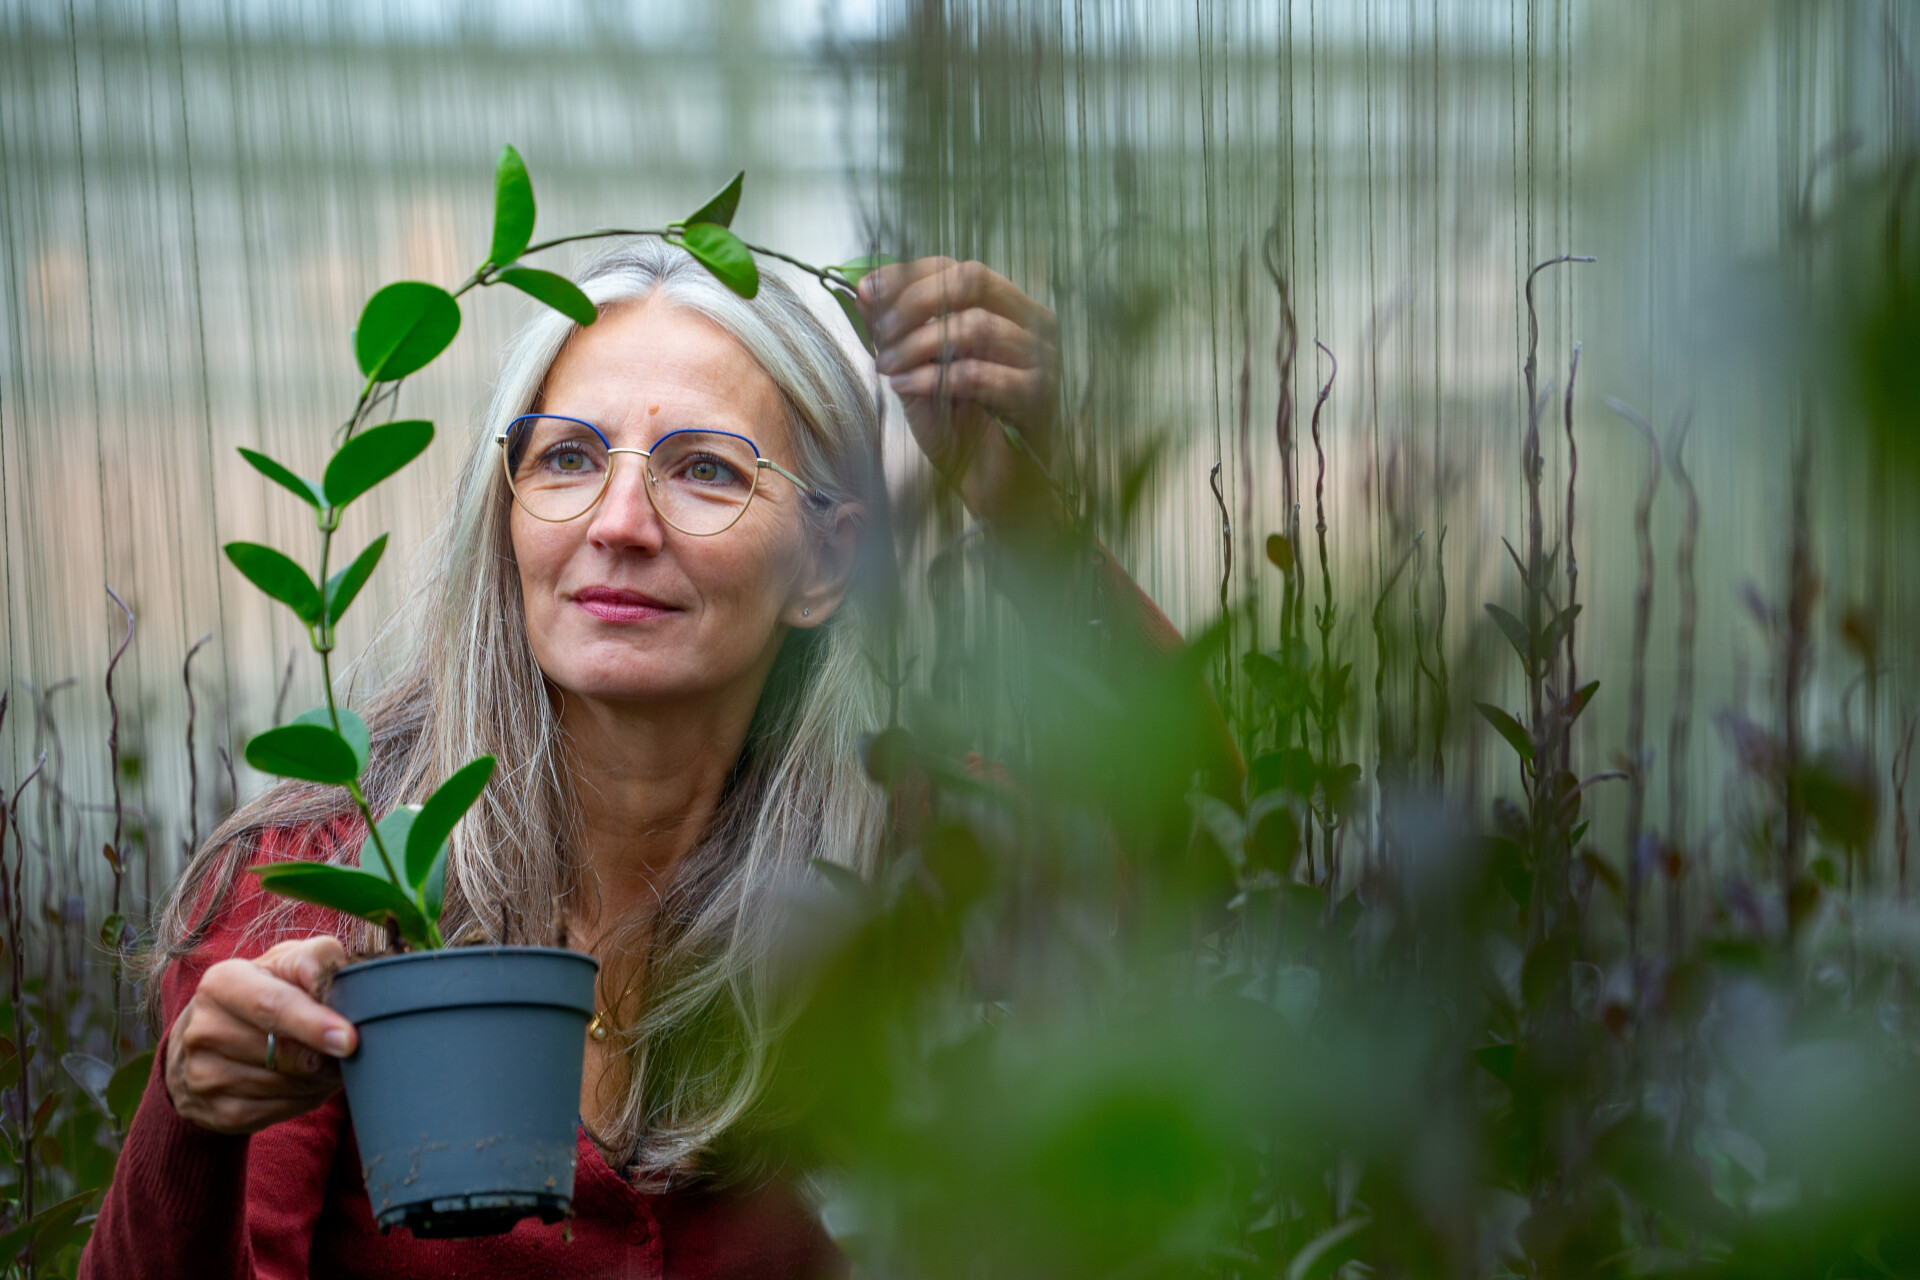 Kwekerreportage seizoensplanten